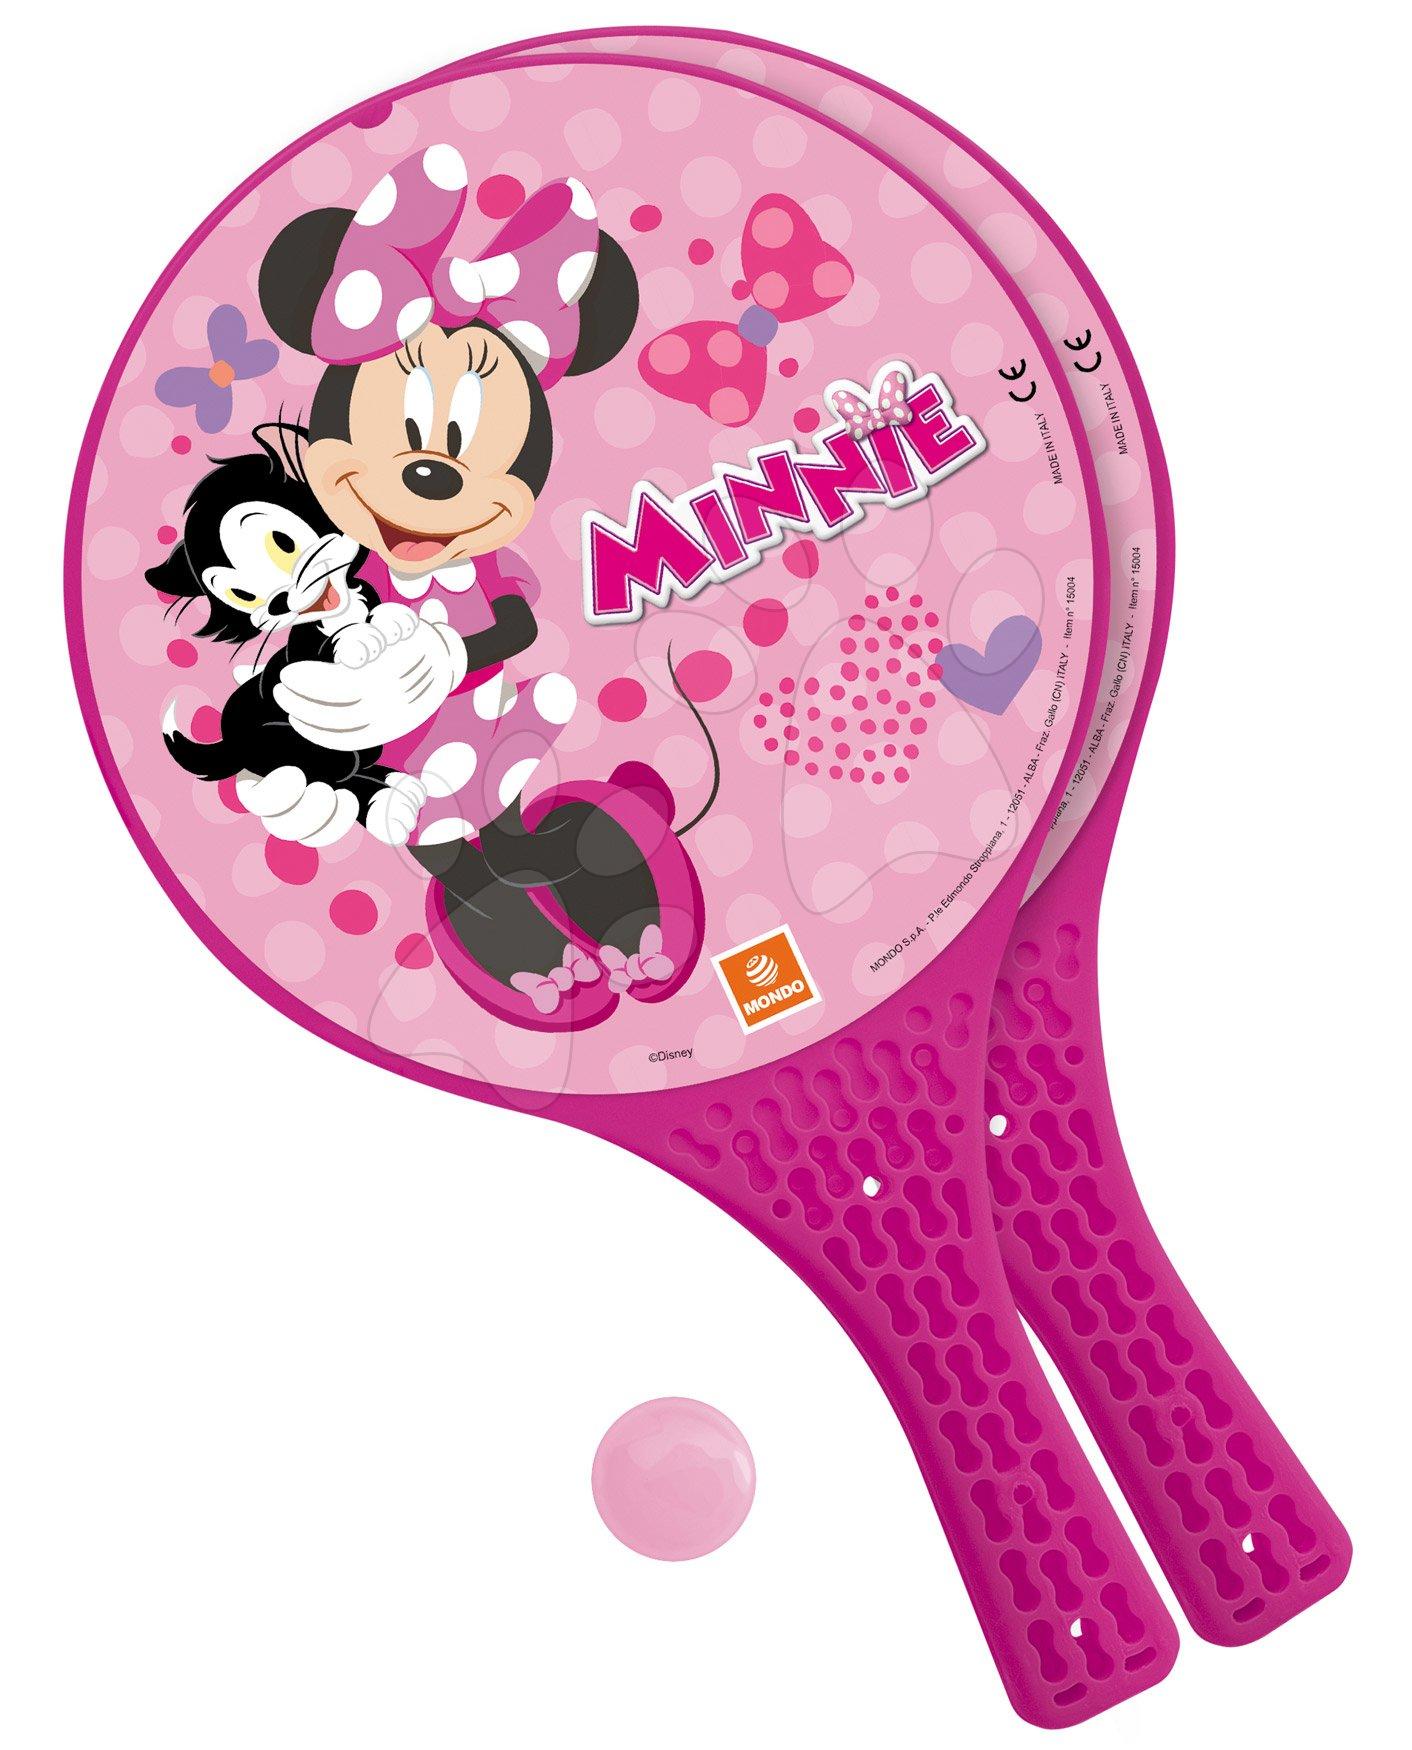 Plážový tenis set Minnie Mondo s 2 raketami a míčkem